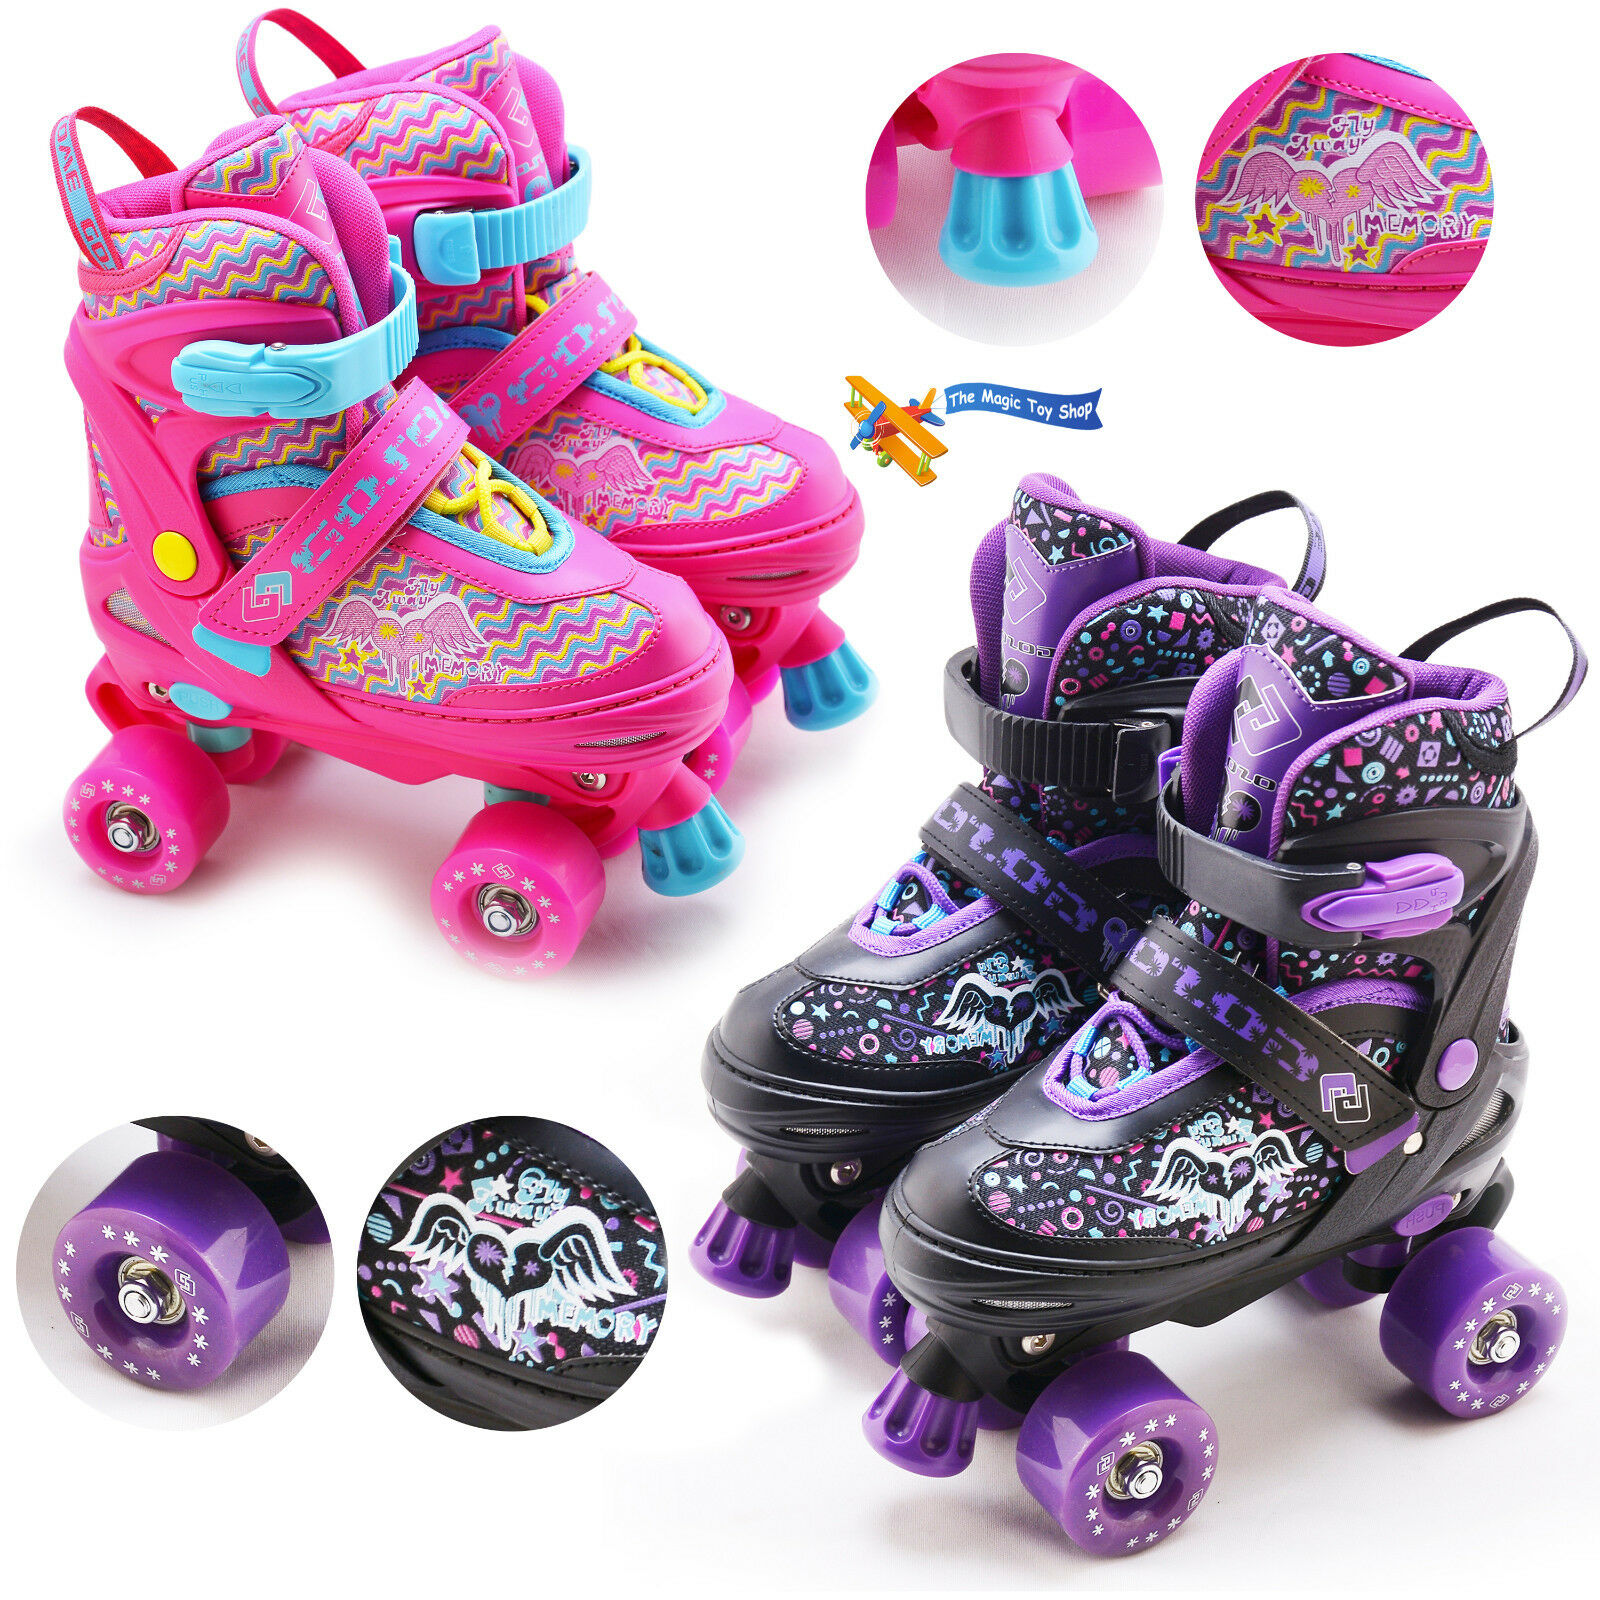 Kinder Verstellbar 4 Wheels Quad Rollschuhe Stiefel Kinder Roller